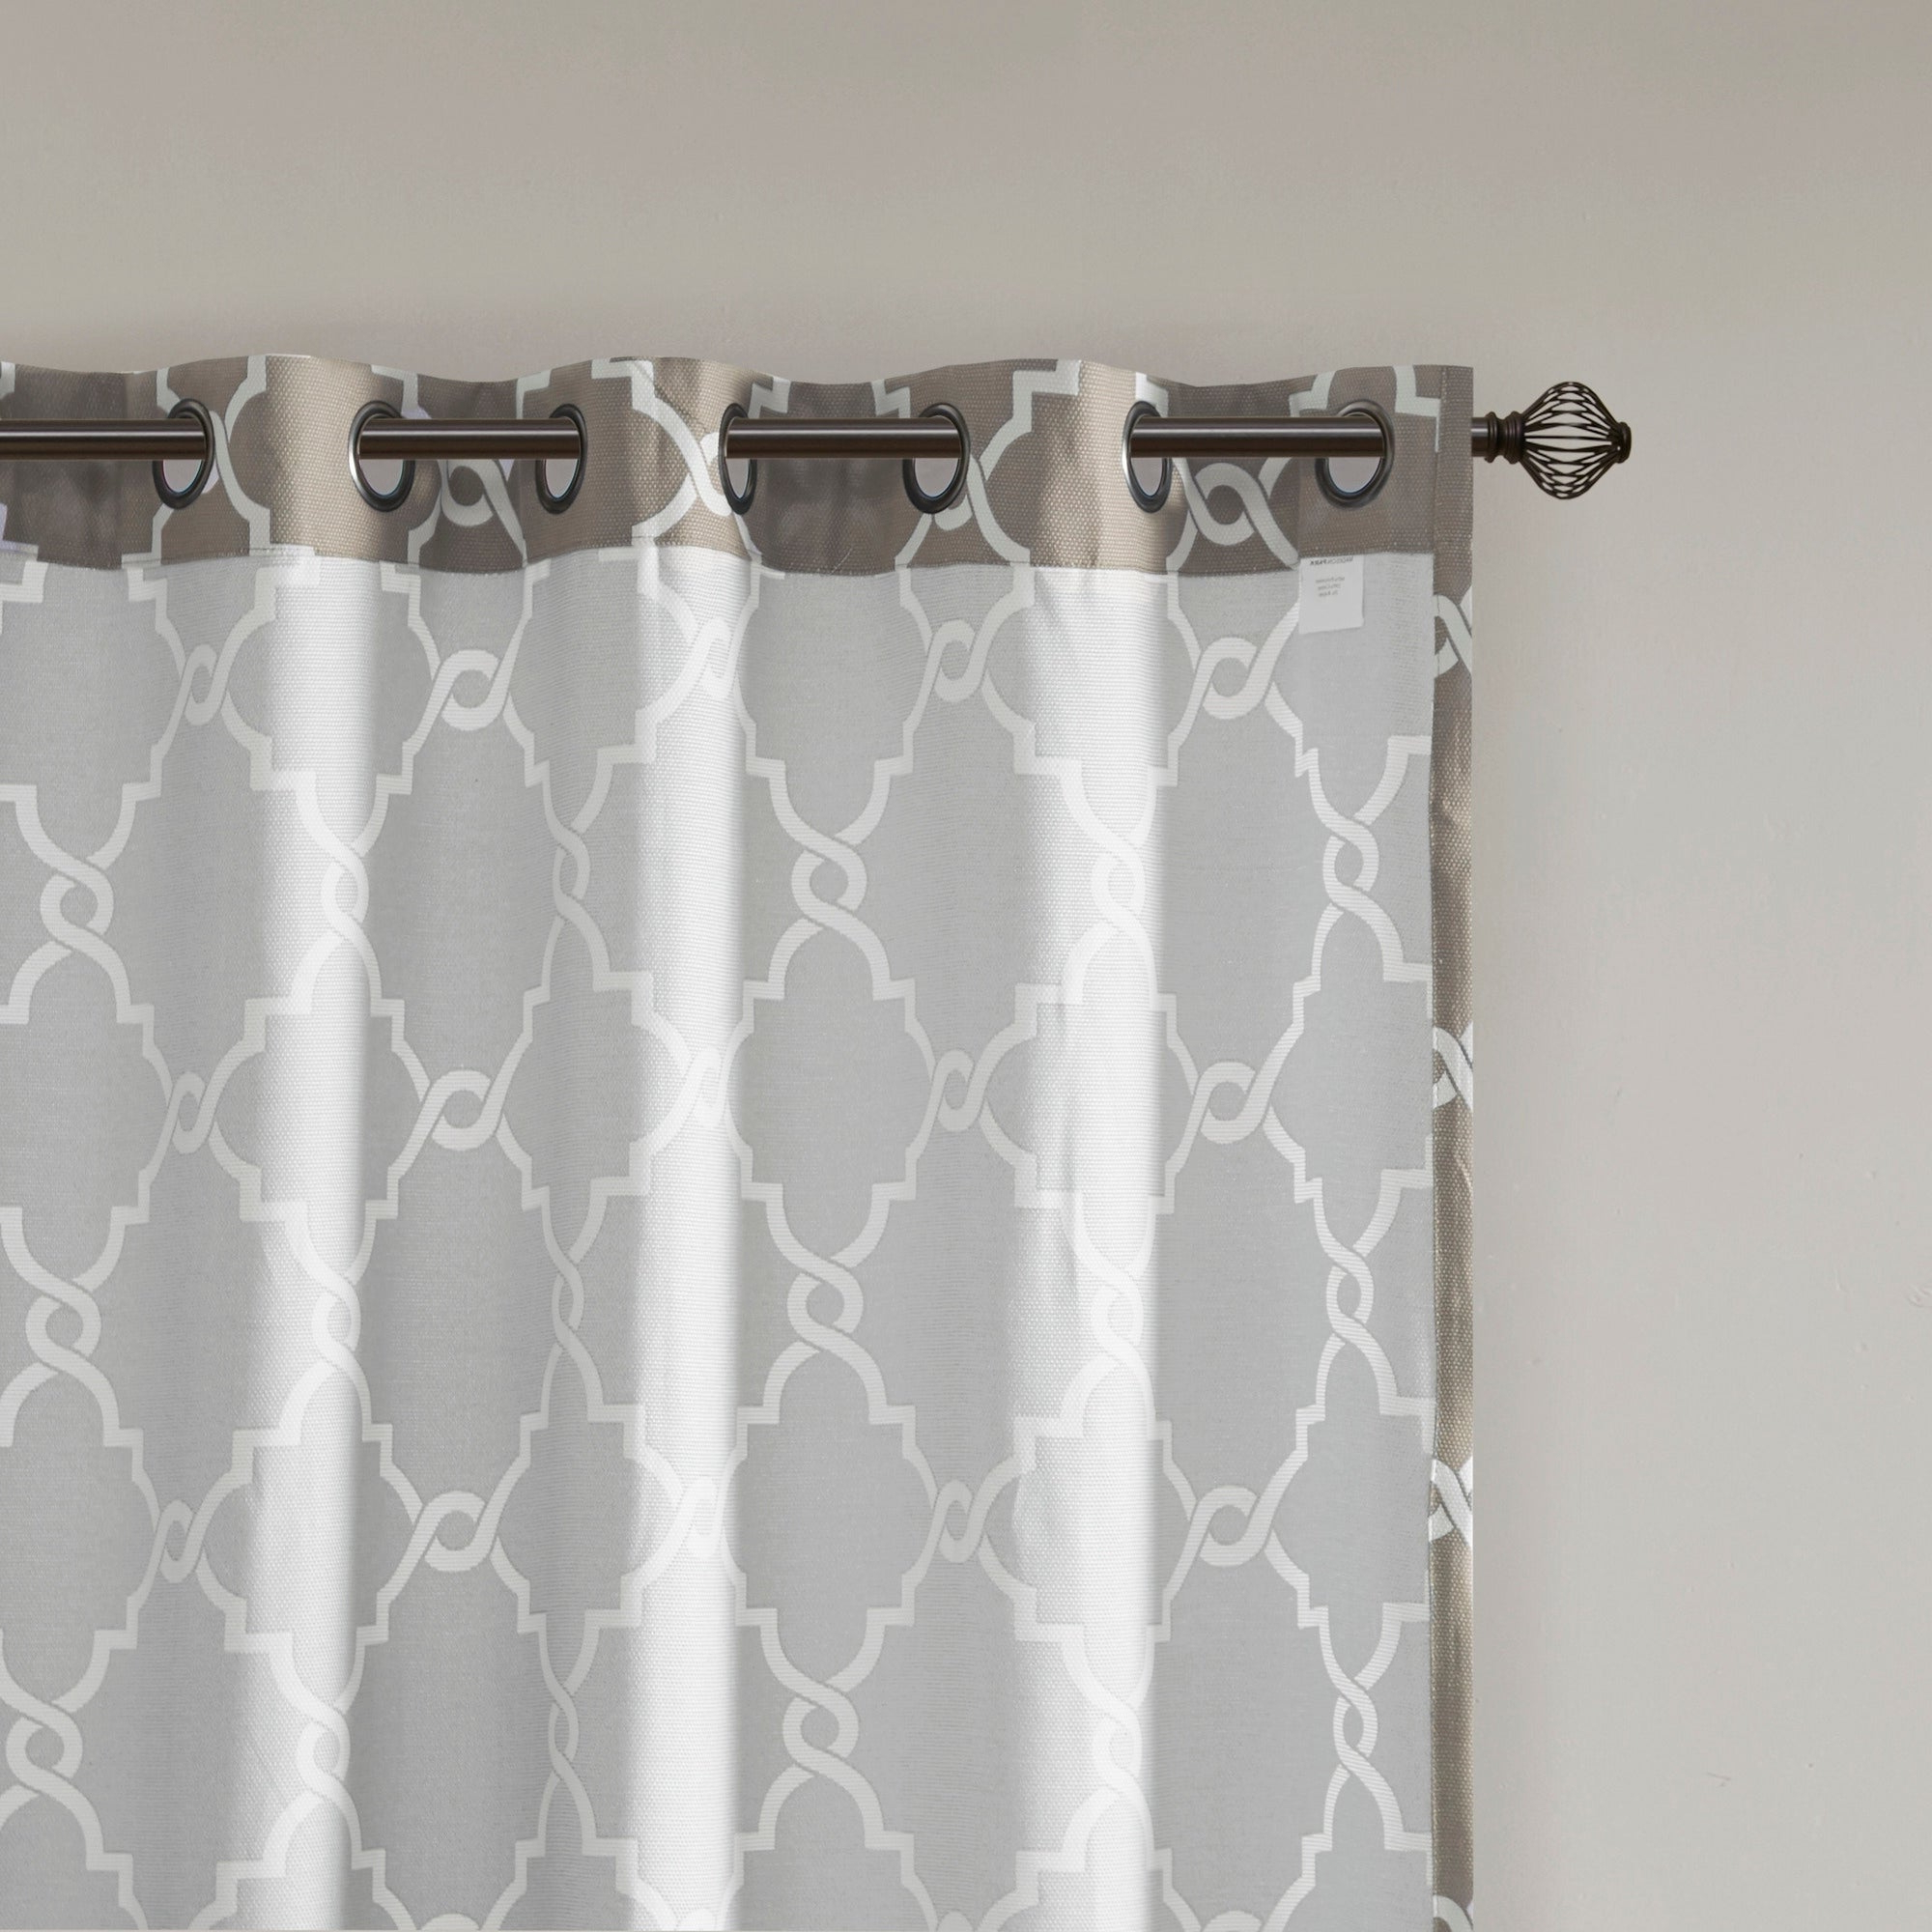 Madison Park Westmont Fretwork Print Pattern Single Curtain Panel Regarding Fashionable Fretwork Print Pattern Single Curtain Panels (Gallery 3 of 20)